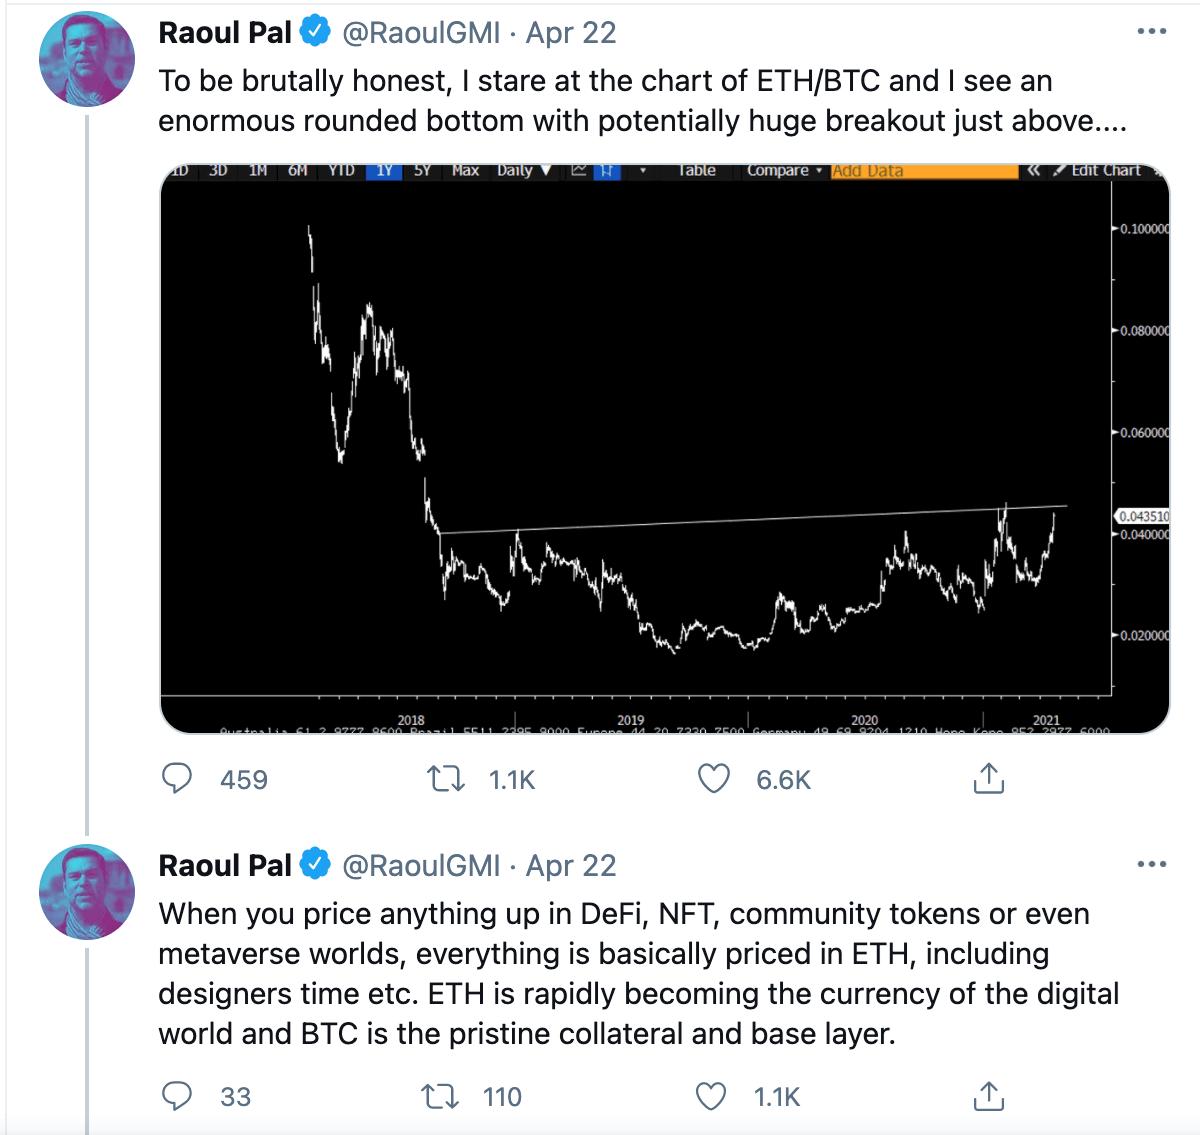 Raoul Paul Tweet - ETH/BTC Chart